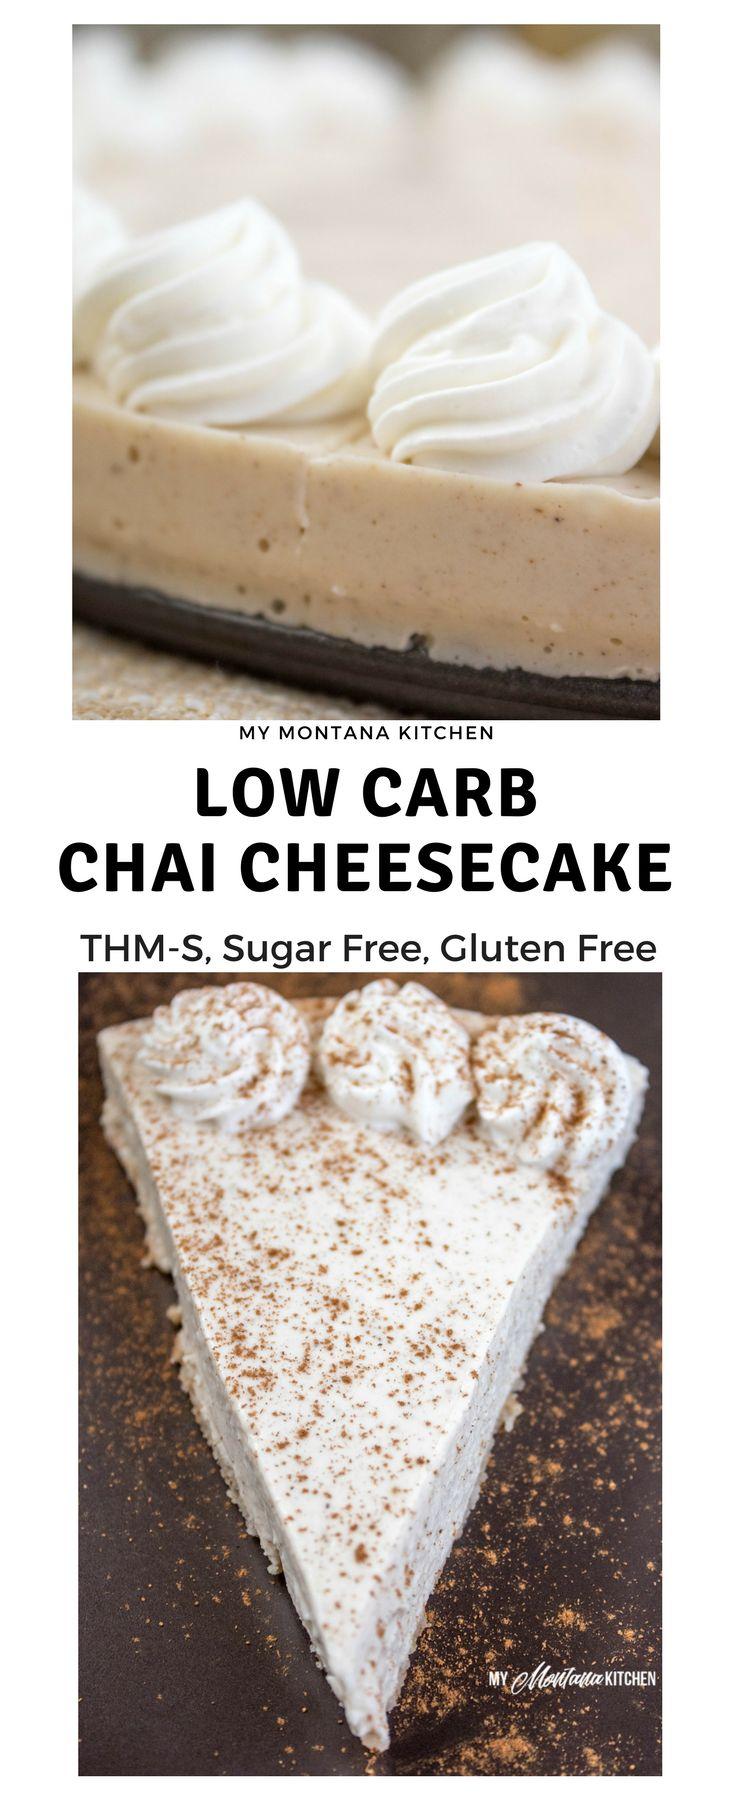 Low Carb Chai Cheesecake (THM-S, Sugar Free, Gluten Free) #trimhealthymama #thm #sugarfree #lowcarb #glutenfree #mymontanakitchen #chai #cheesecake #chaicheesecake